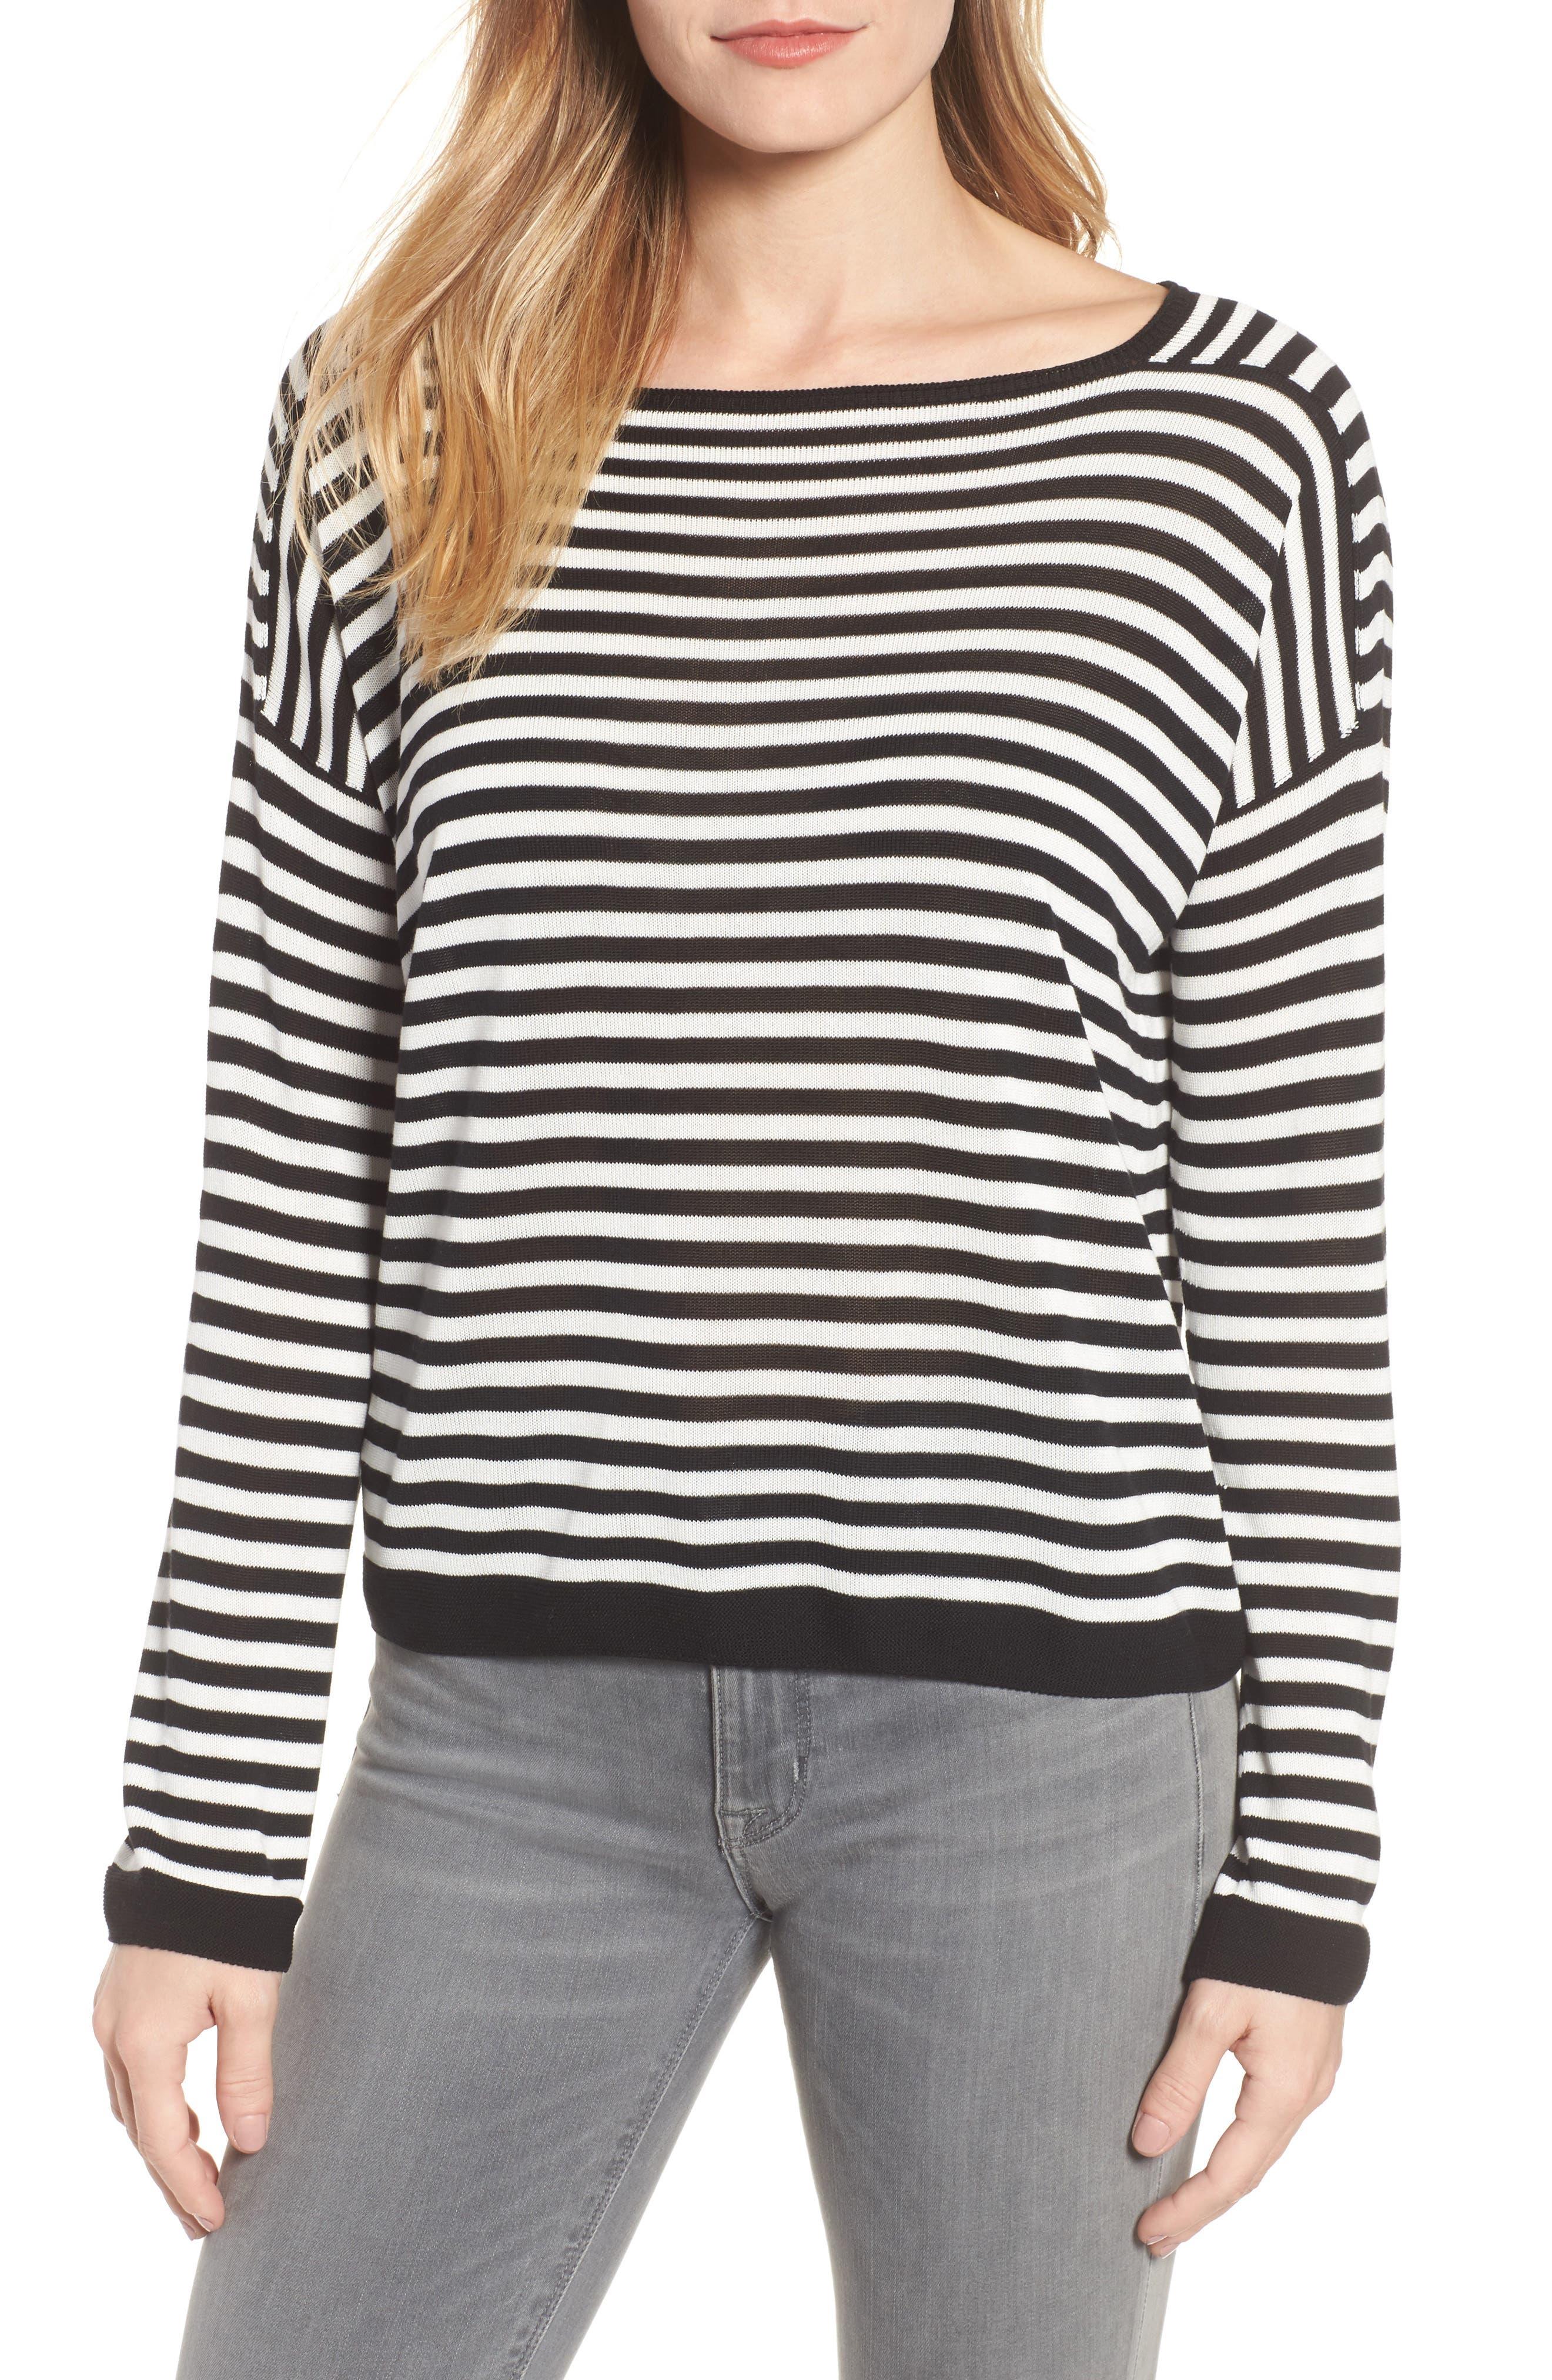 Stripe Tencel<sup>®</sup> Lyocell Knit Sweater,                             Main thumbnail 1, color,                             Black/ Soft White